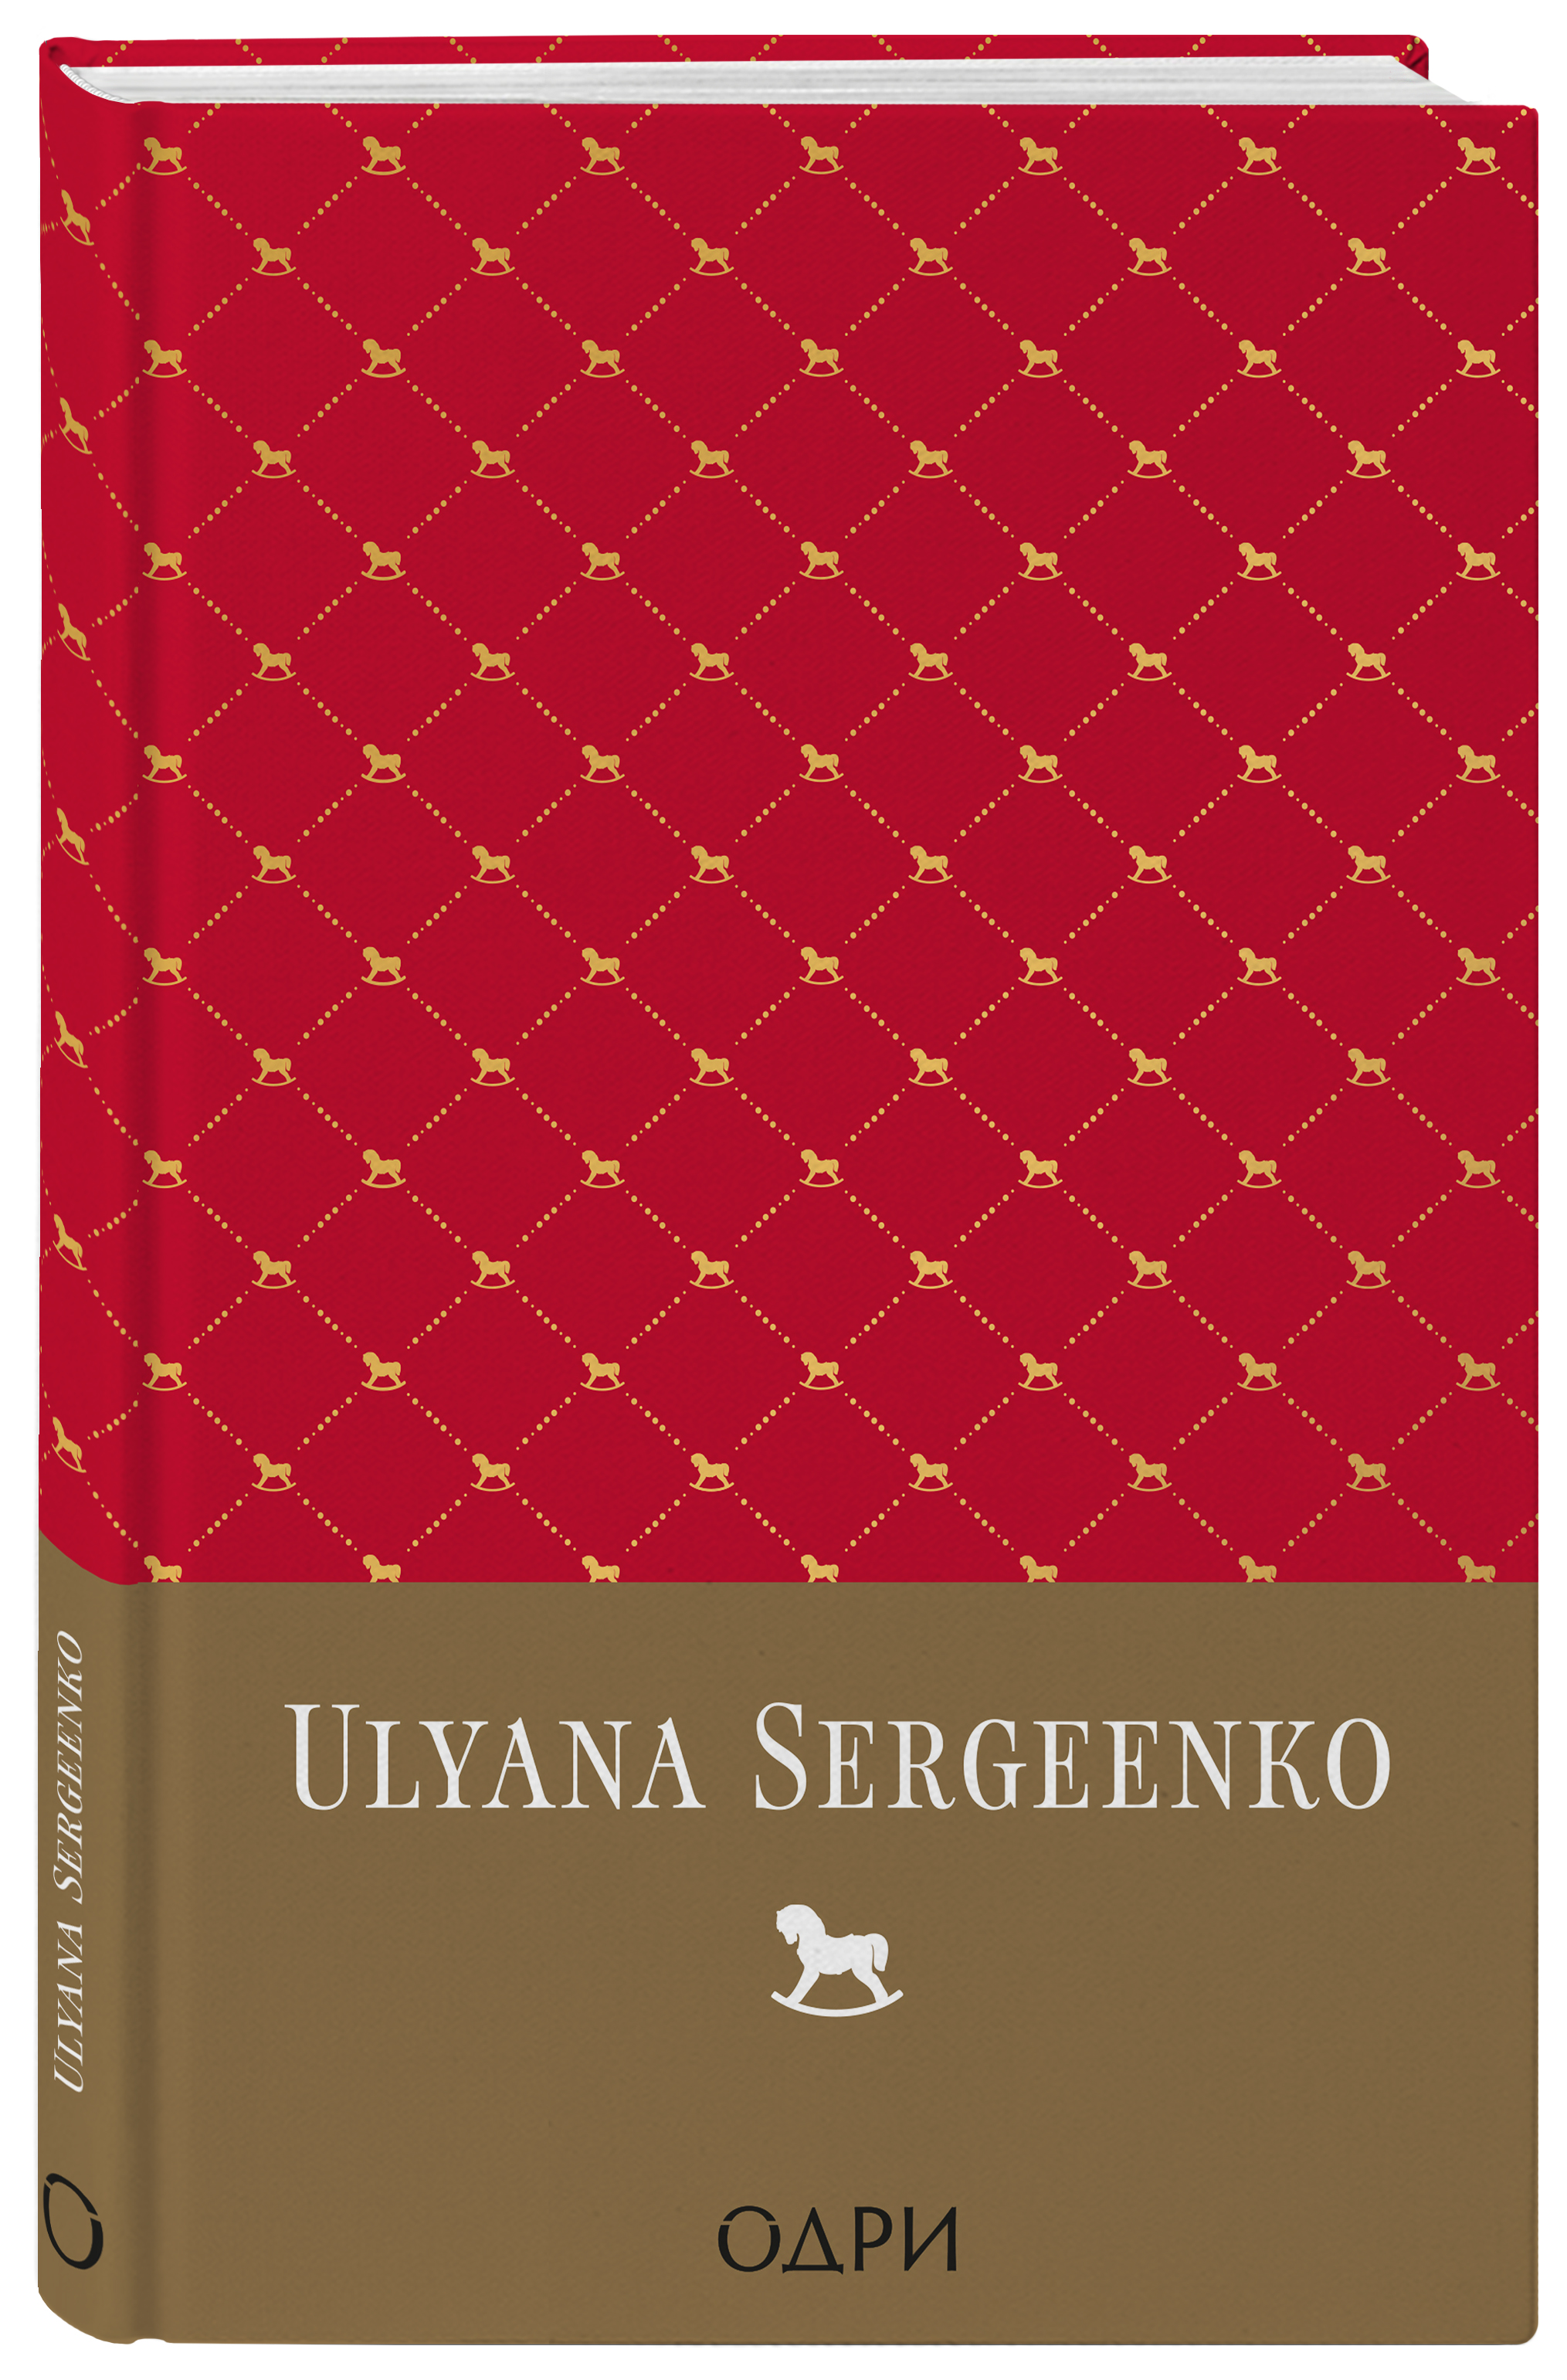 Ulyana Sergeenko / Ульяна Сергеенко. Блокнот